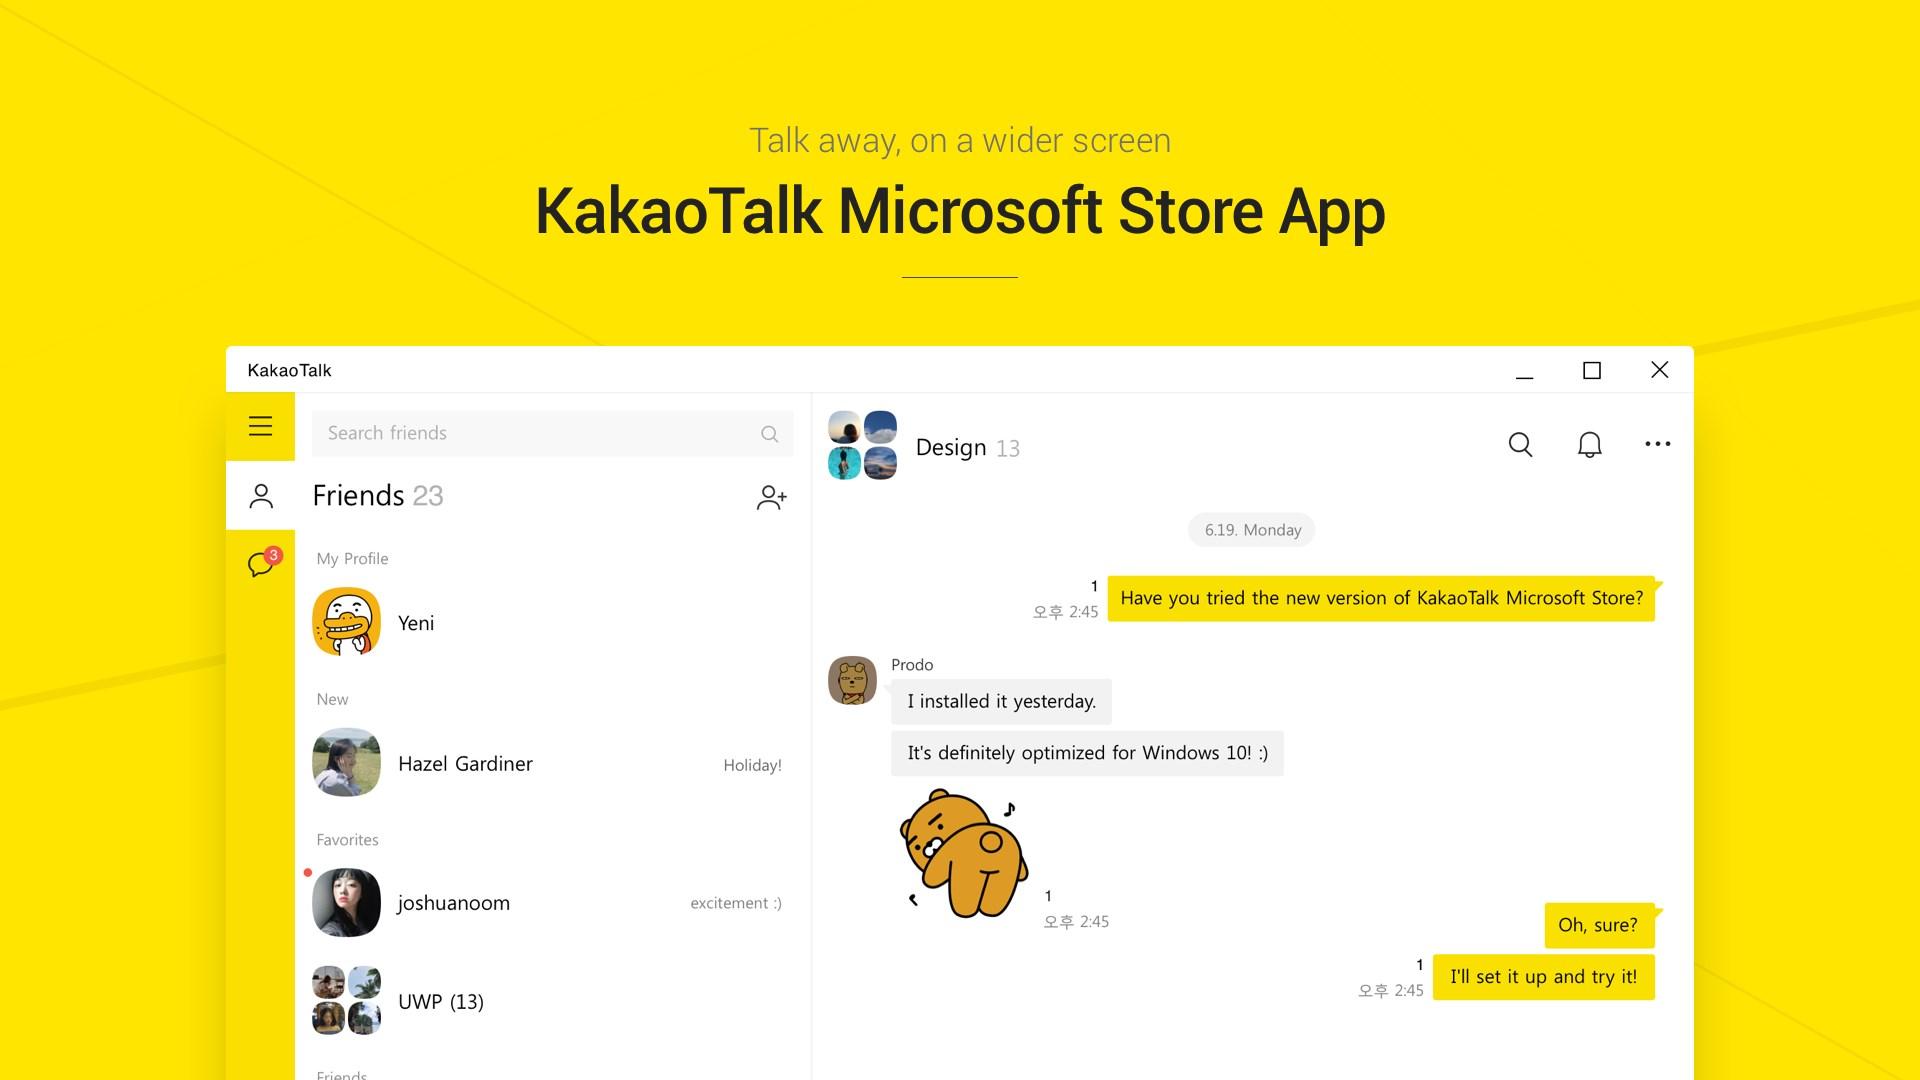 Mobile εφαρμογές dating Windows τηλέφωνο